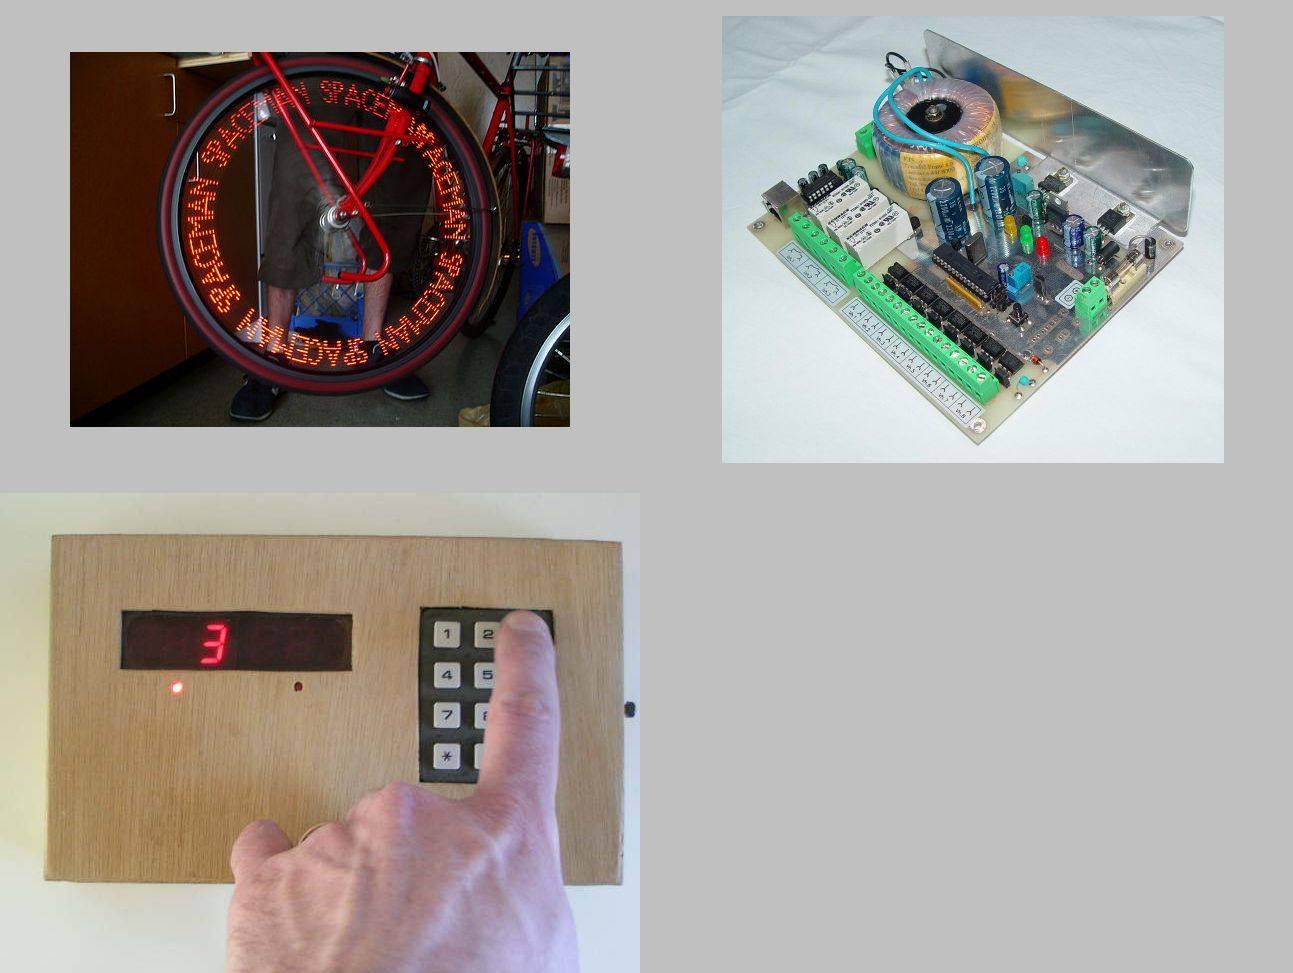 Microchip Pic Circuits Projects Archive Electronics 16f88 Forum And Microcontrollers Elektronik 120x120 Sema Ders Notlari